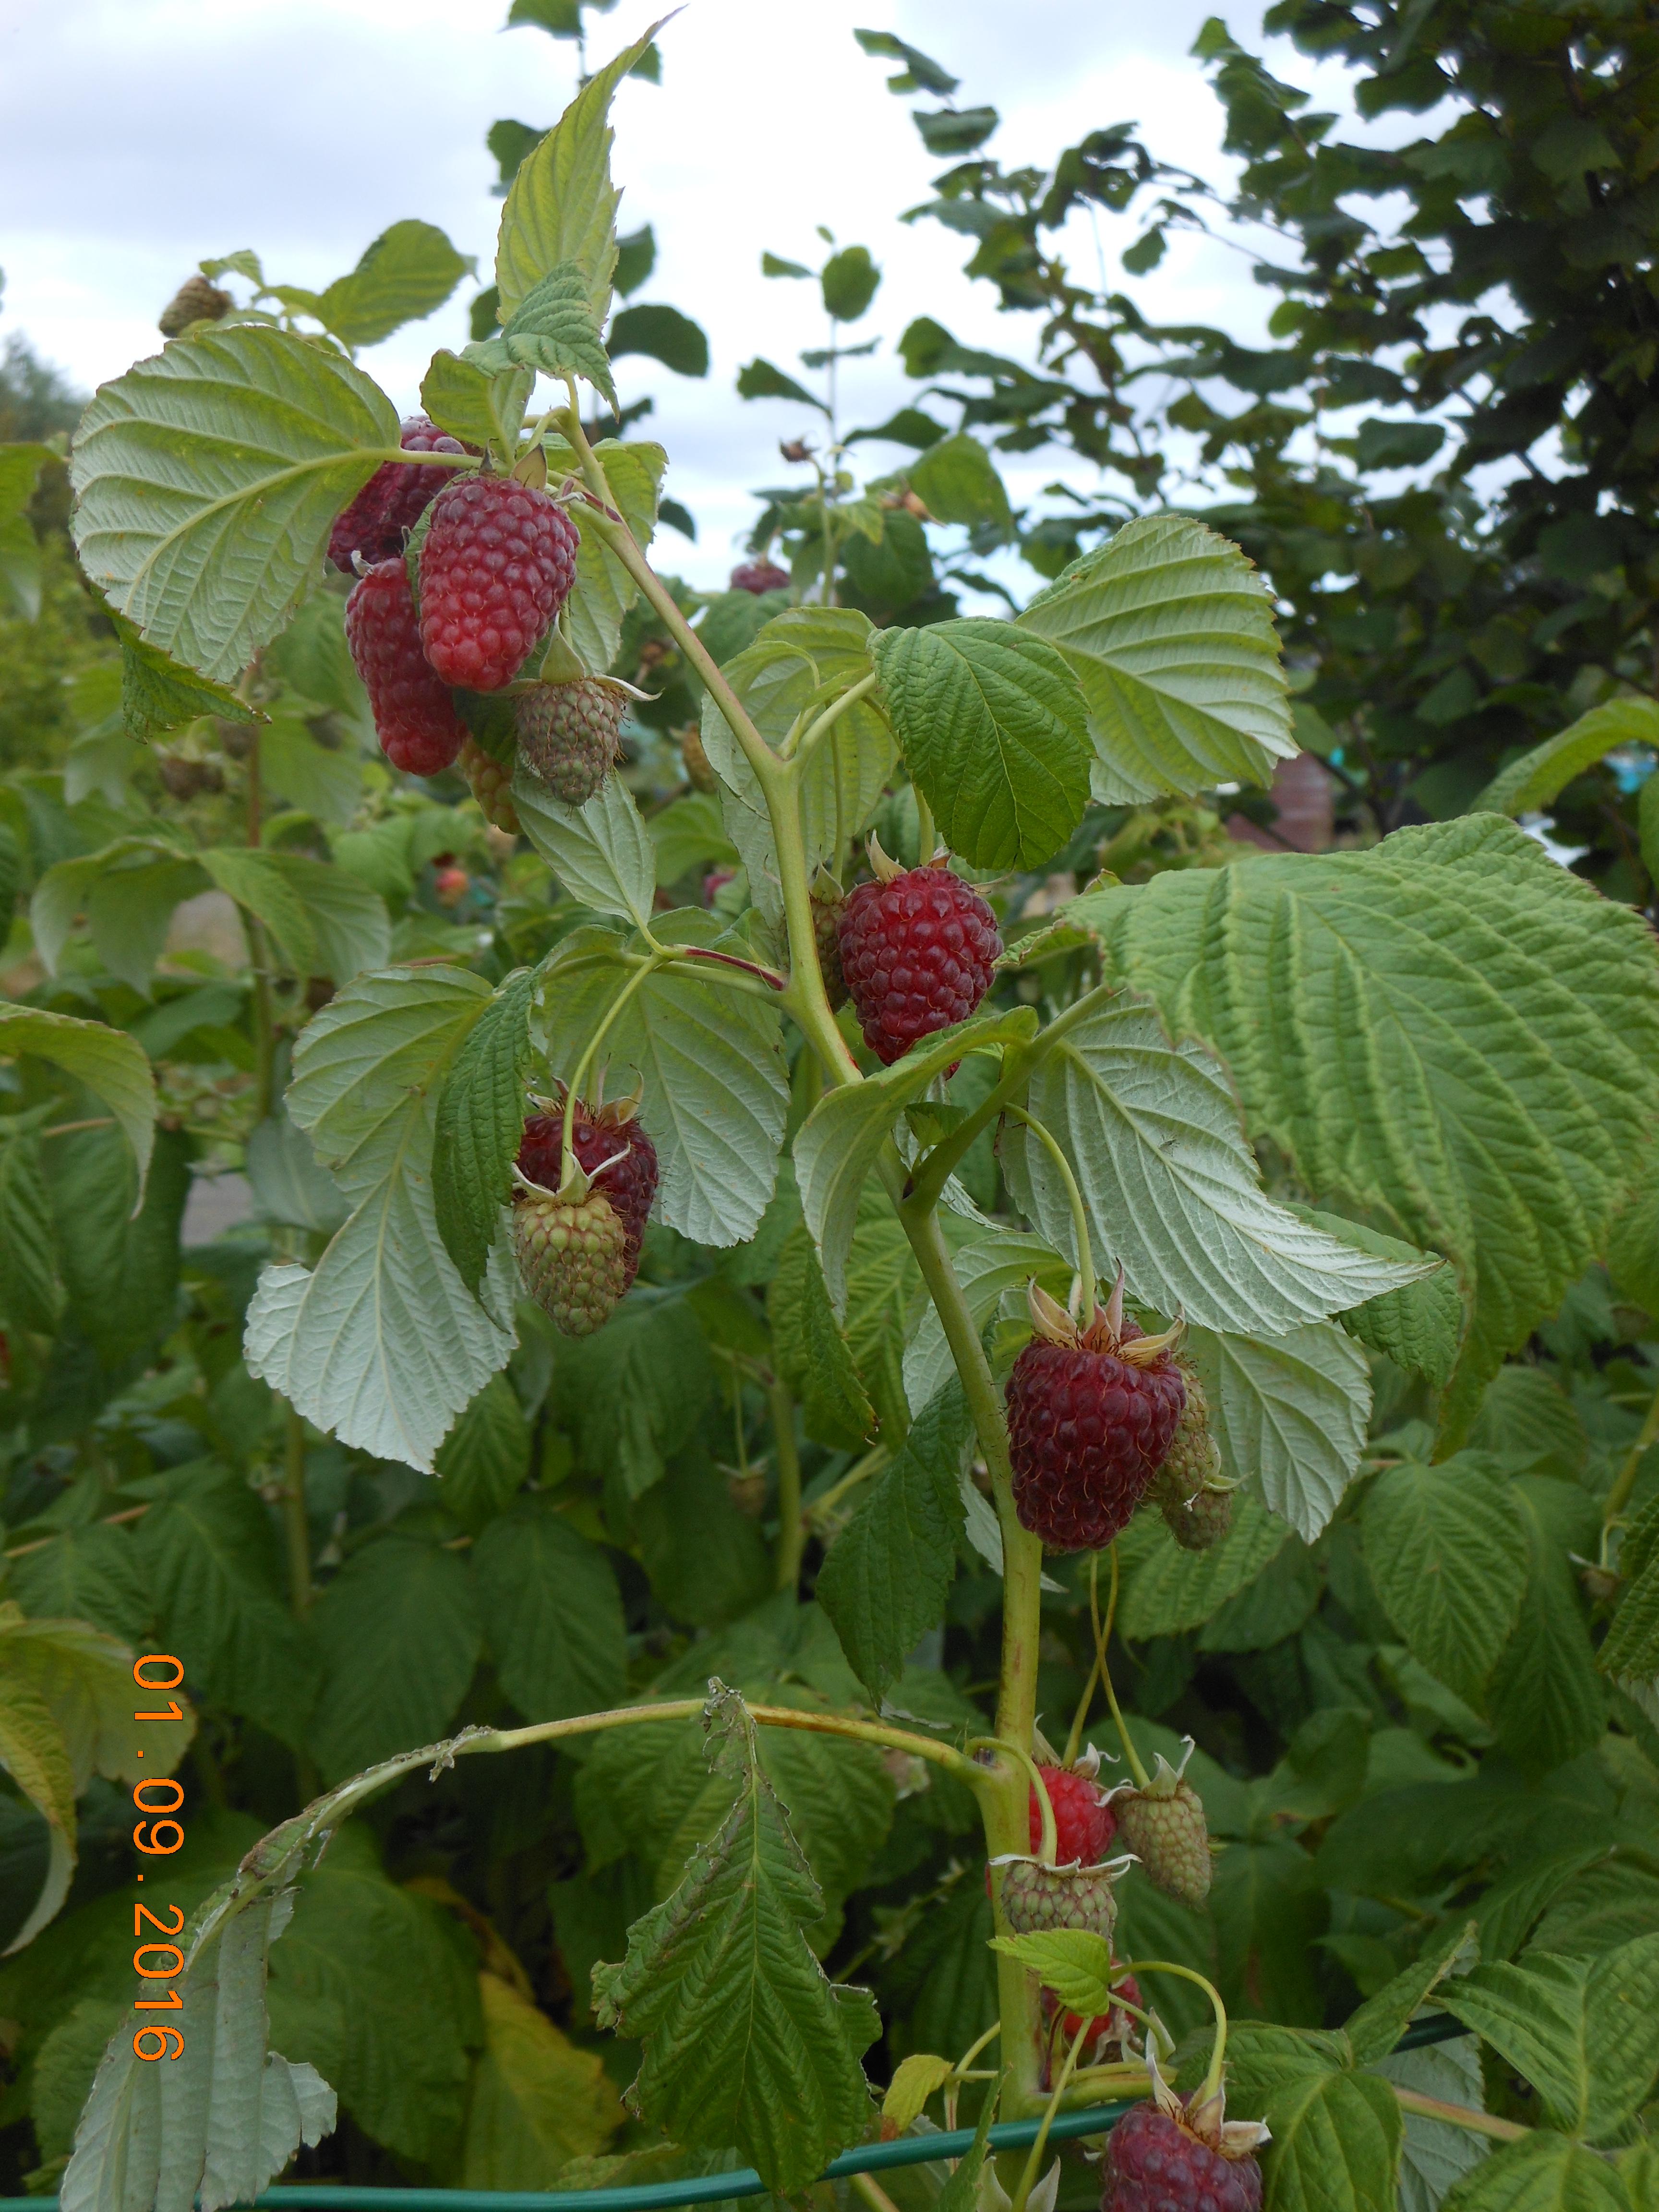 Autumn Raspberrries variety Joan JJPG